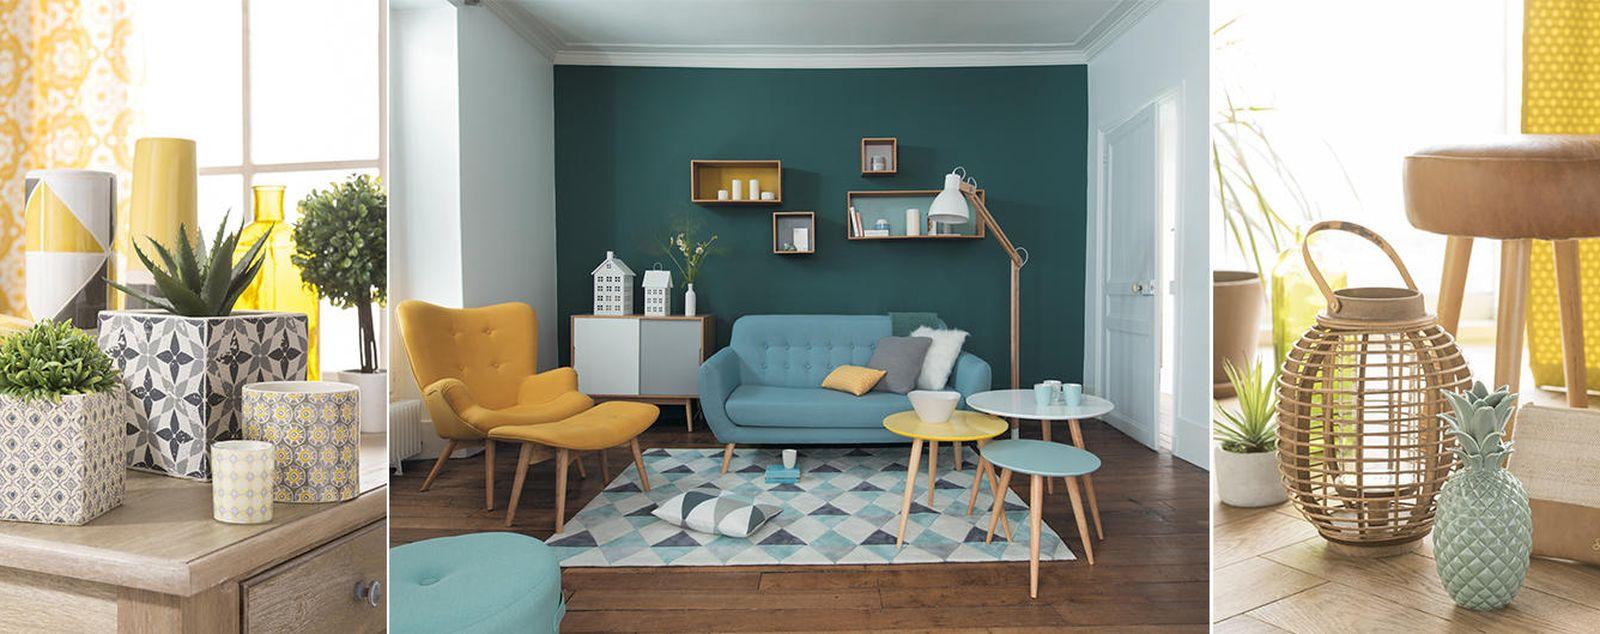 decoracin shopping ideas para decorar un piso de soltera fotogaleras de estilo